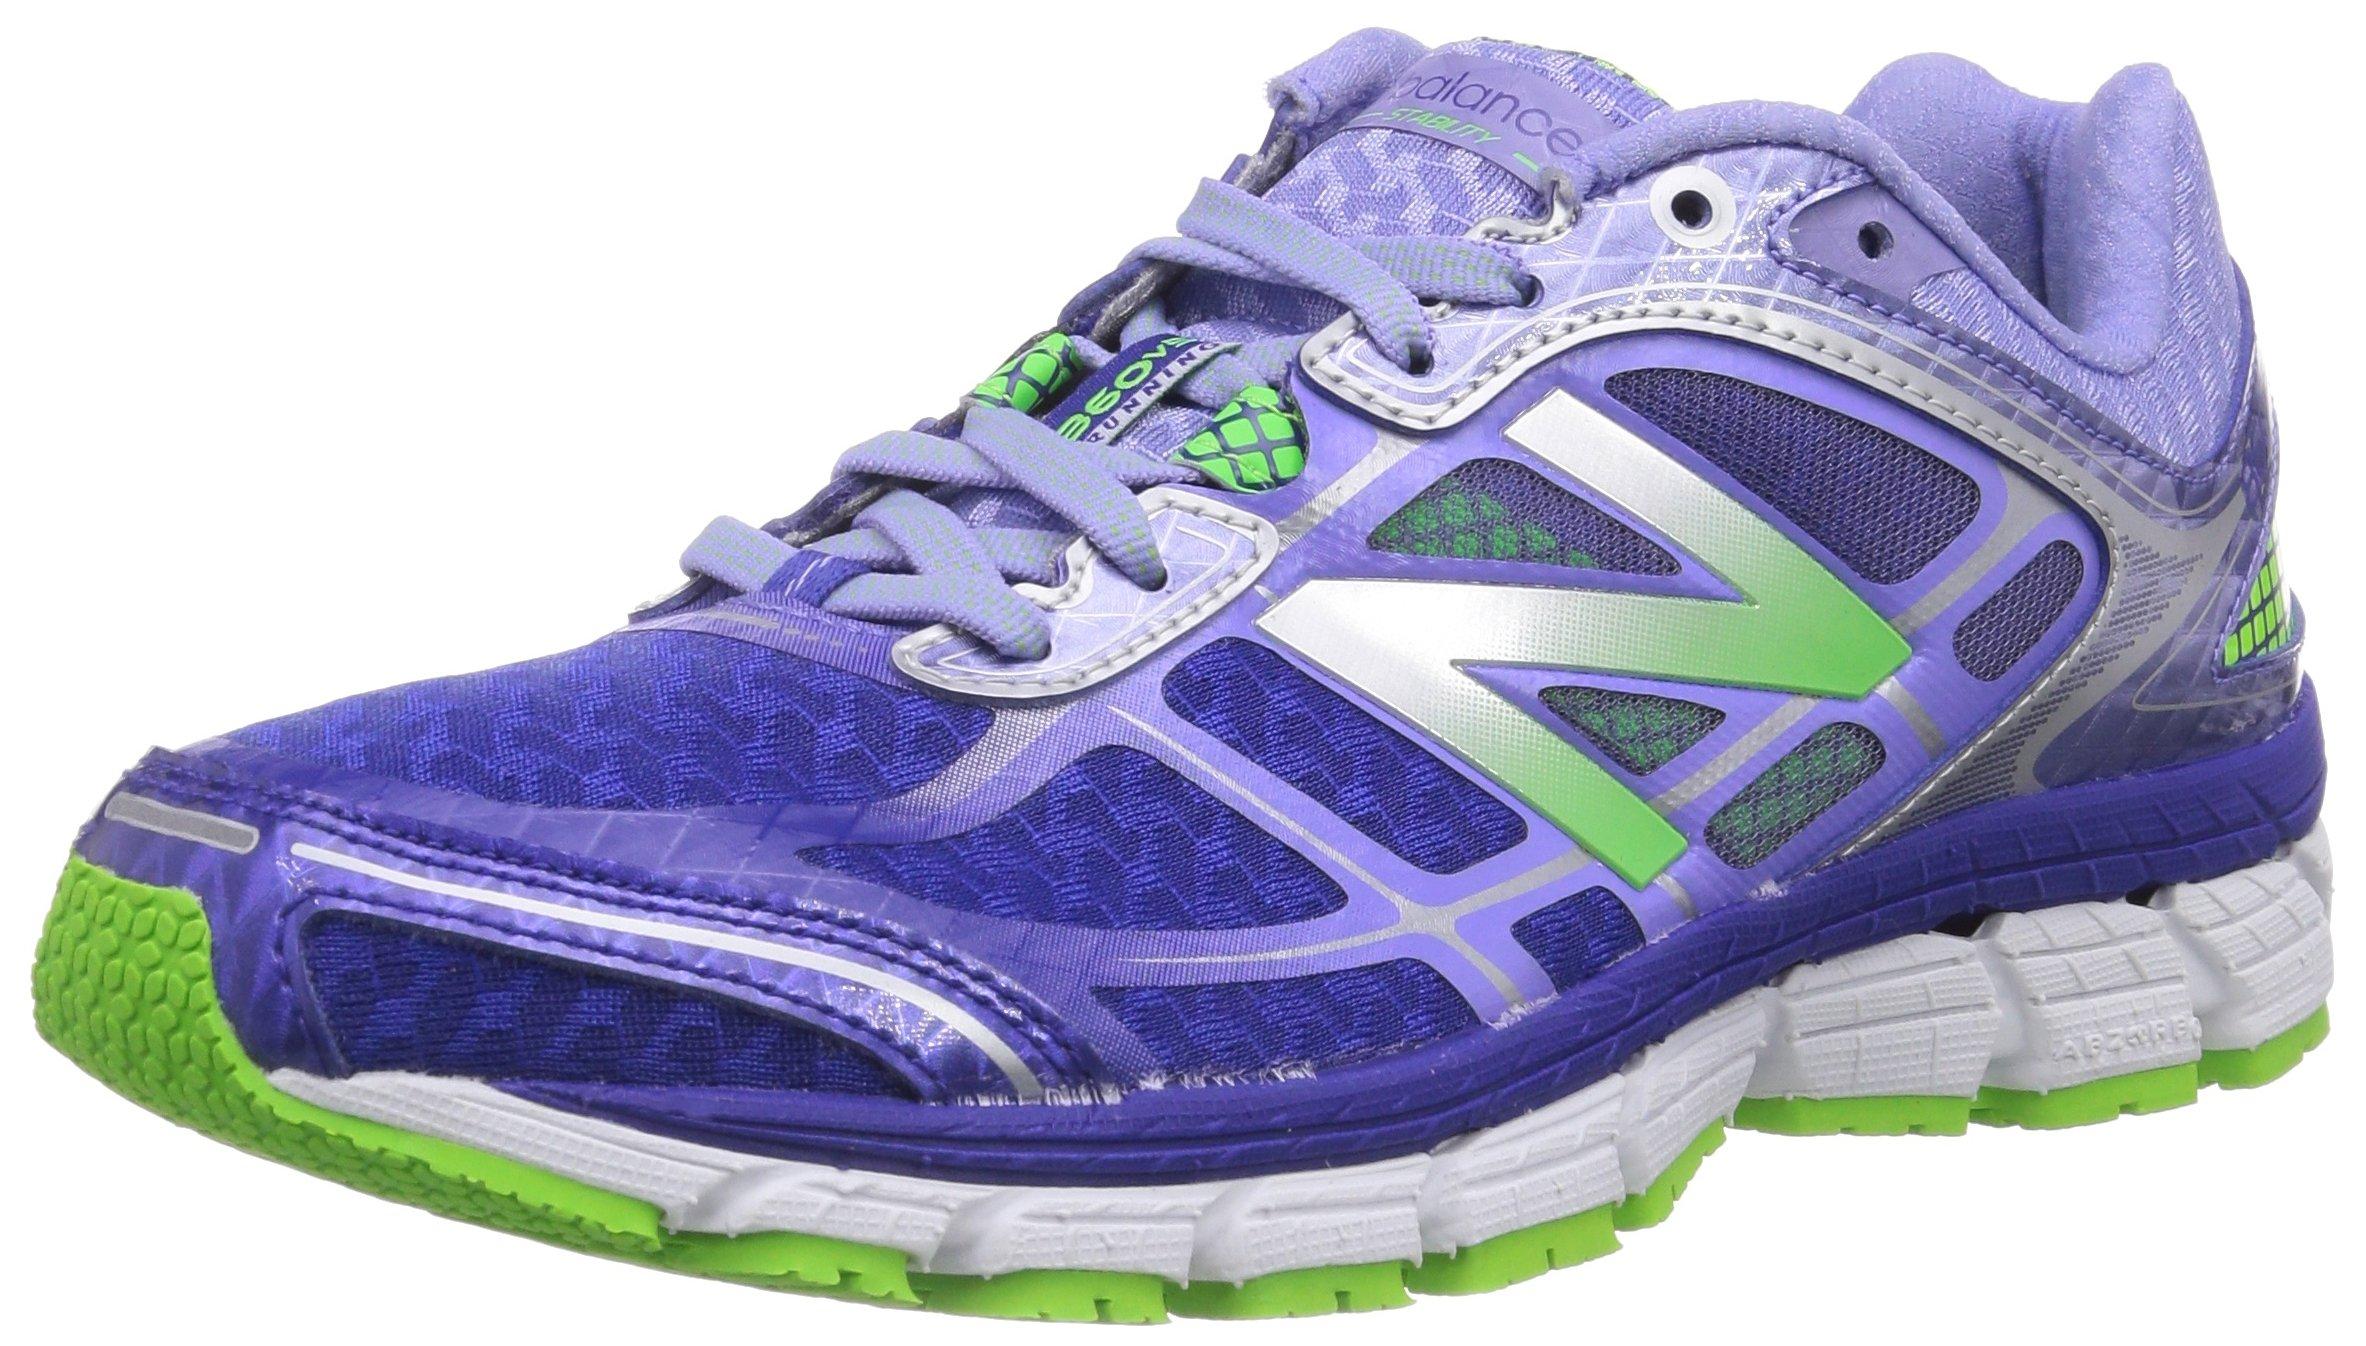 W860 Purple Eu De FemmeMulticolore 5 green37 B Balance Mehrfarbigpp5 Running V5Chaussures New EDI9WH2